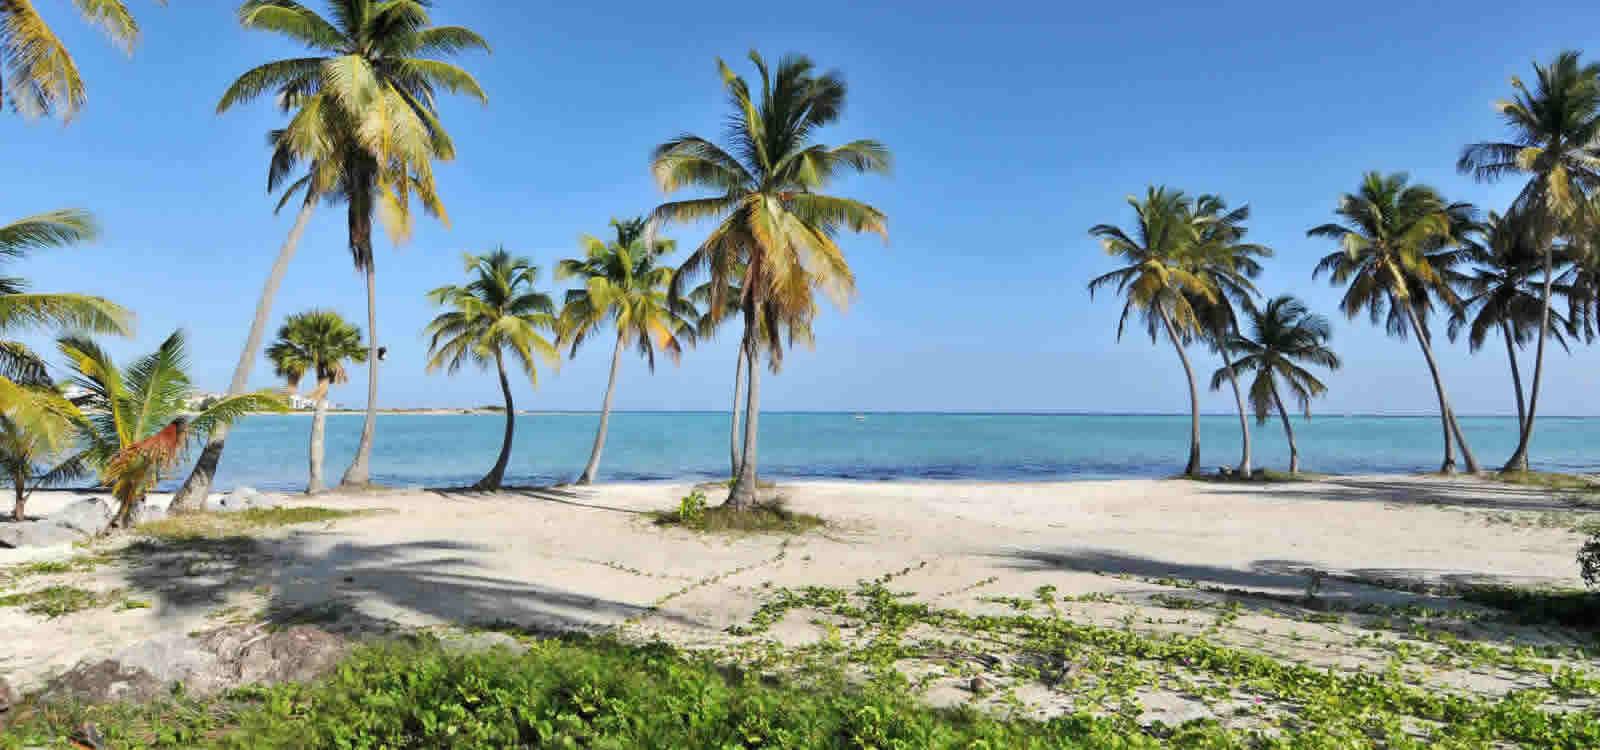 Beachfront Lots Of Land For Juanillo Beach Cap Cana Dominican Republic 7th Heaven Properties